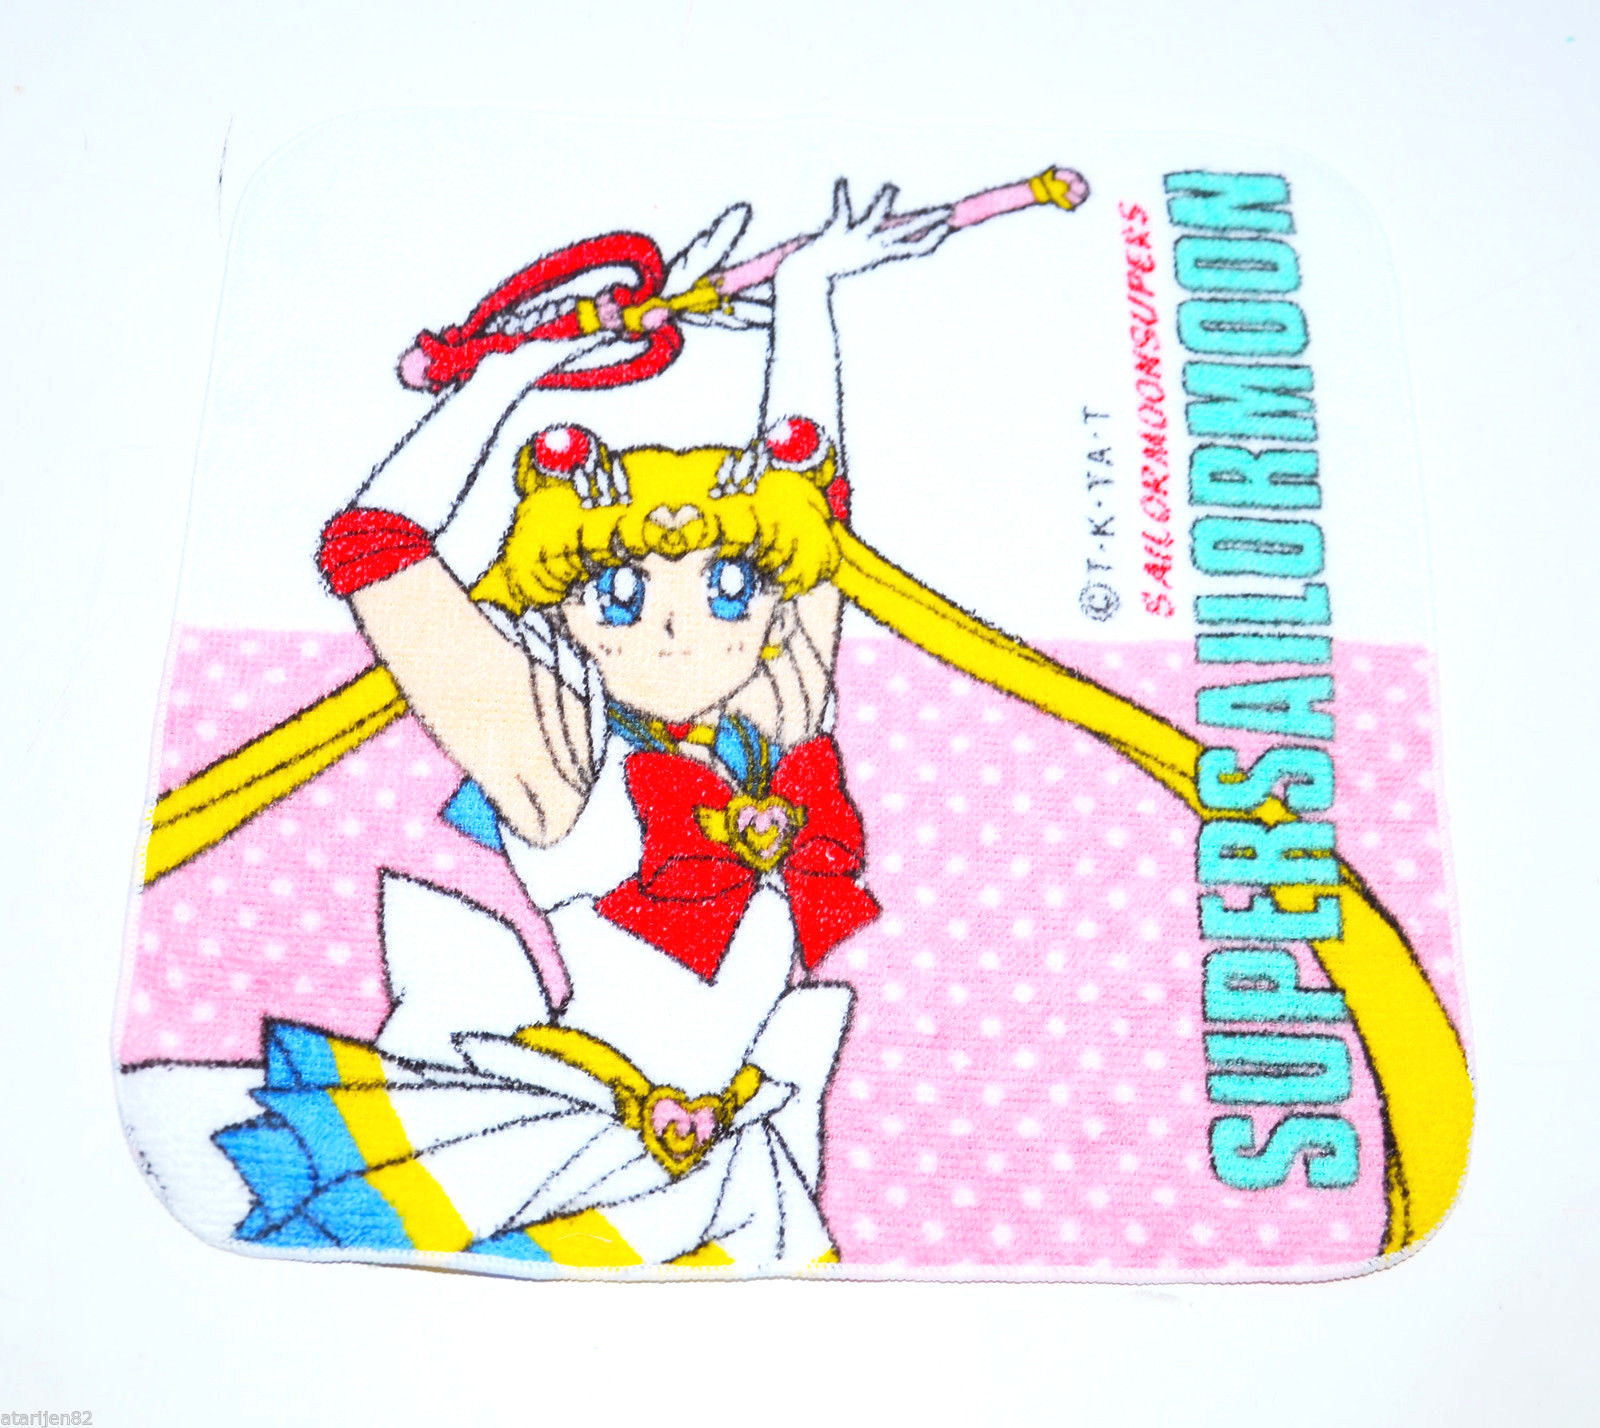 Bandai Sailor Moon SuperS Super S towel rag Japan import kaleidomoonscope wand - $9.89